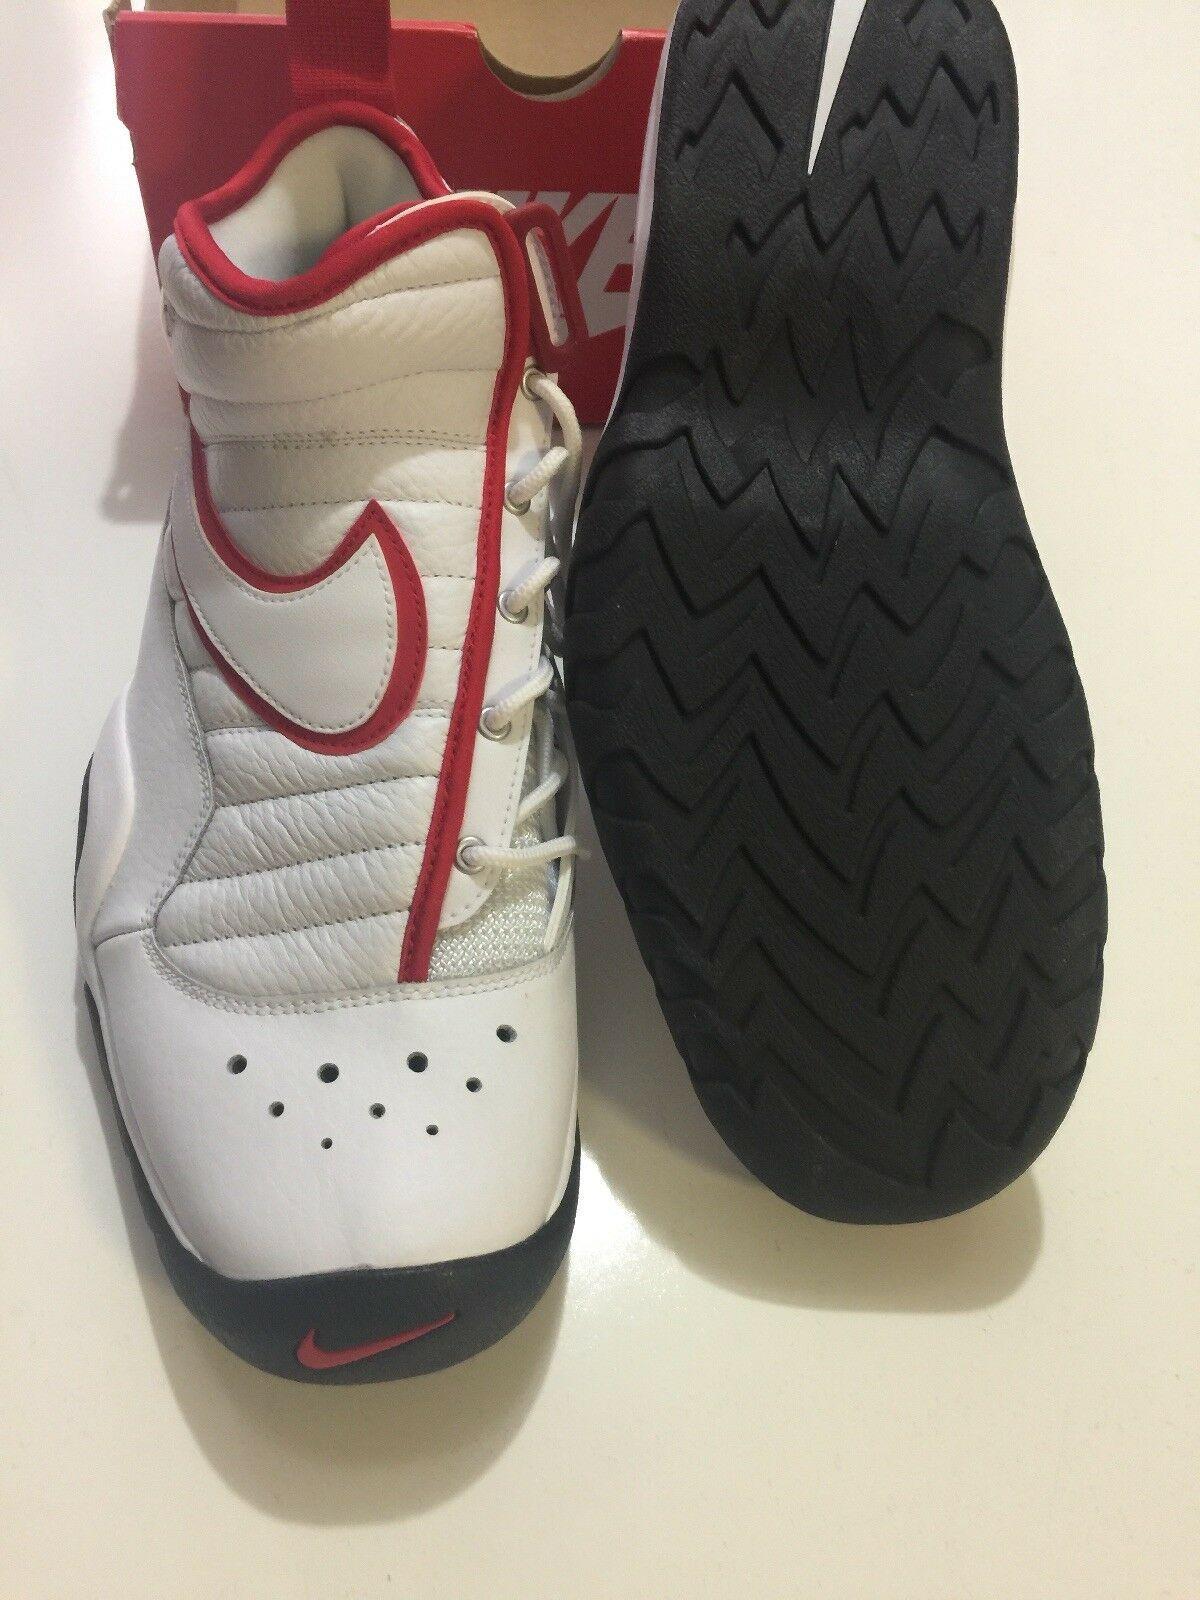 Nike Air Shake Ndestrukt Men's Basketball Shoes White/Red 880869 100 Size 11 image 3